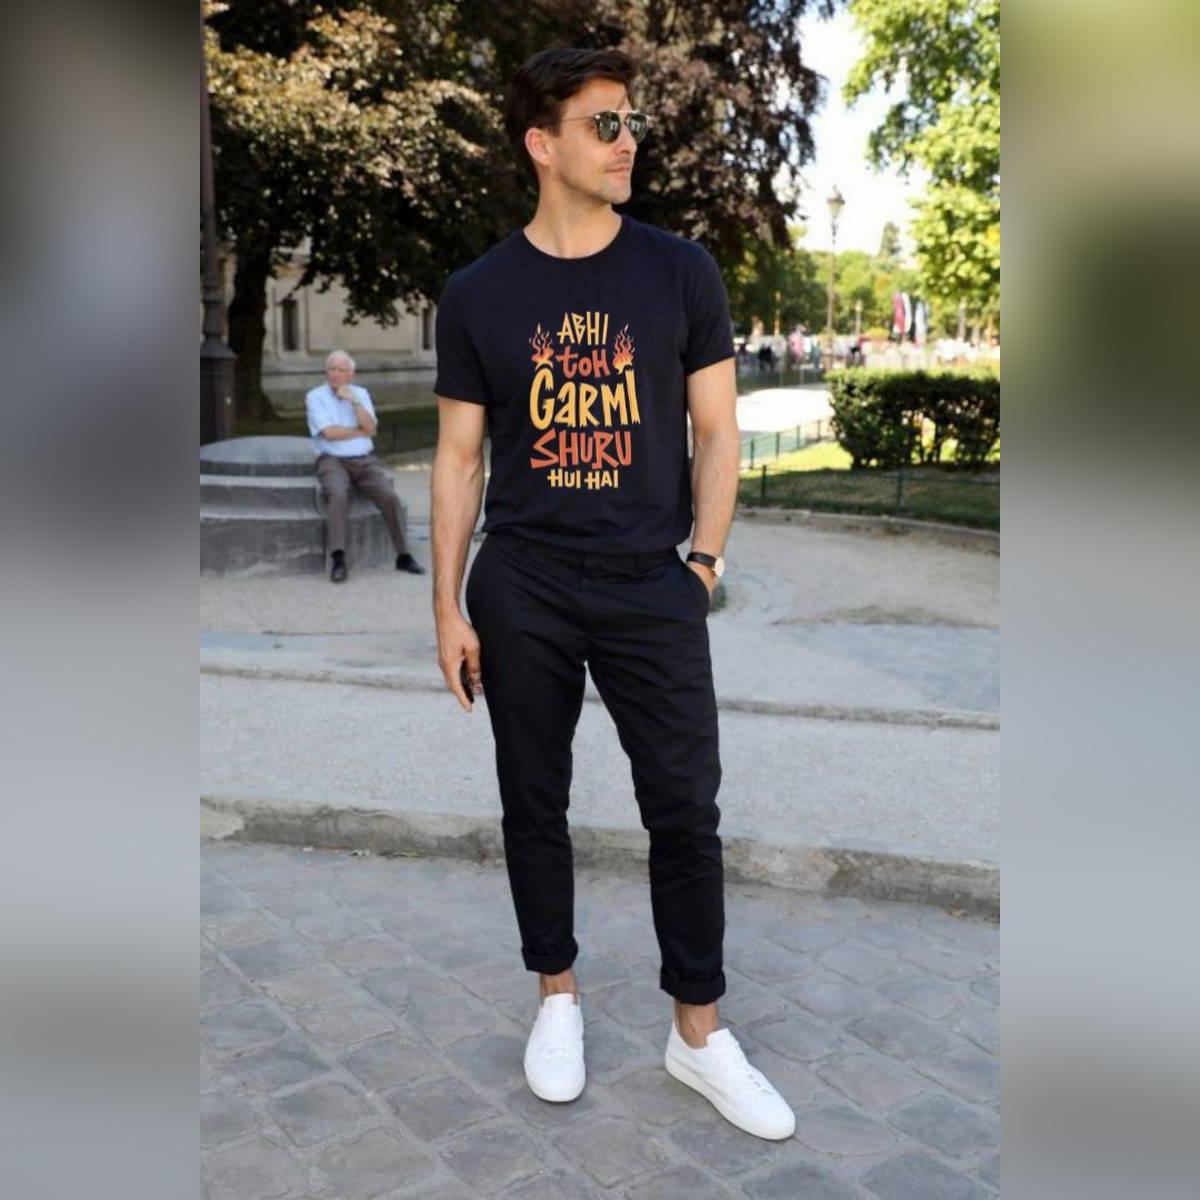 Abhi to garmi shuru hui hai Casual Summer Wear Printed Half sleeve round neck T shirt for Men/Boys